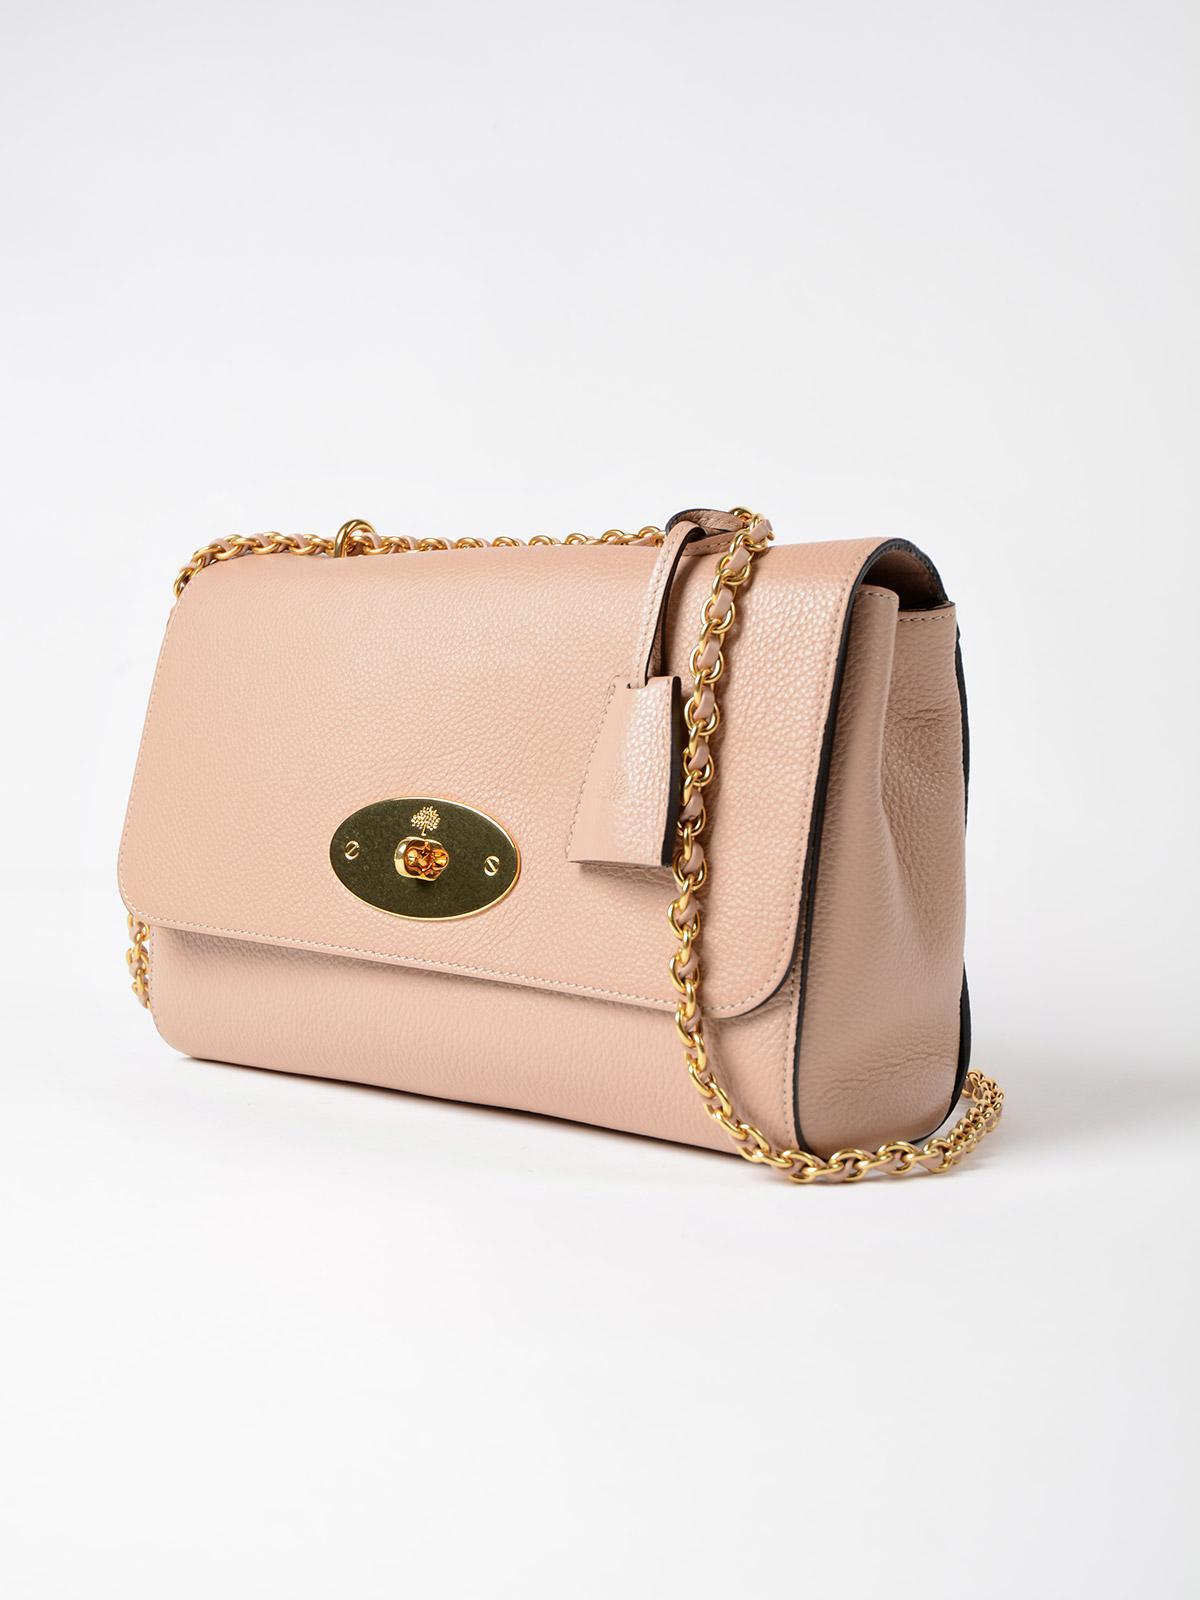 9036edc3ccb ... promo code for lyst mulberry medium lily bag 59feb 3e177